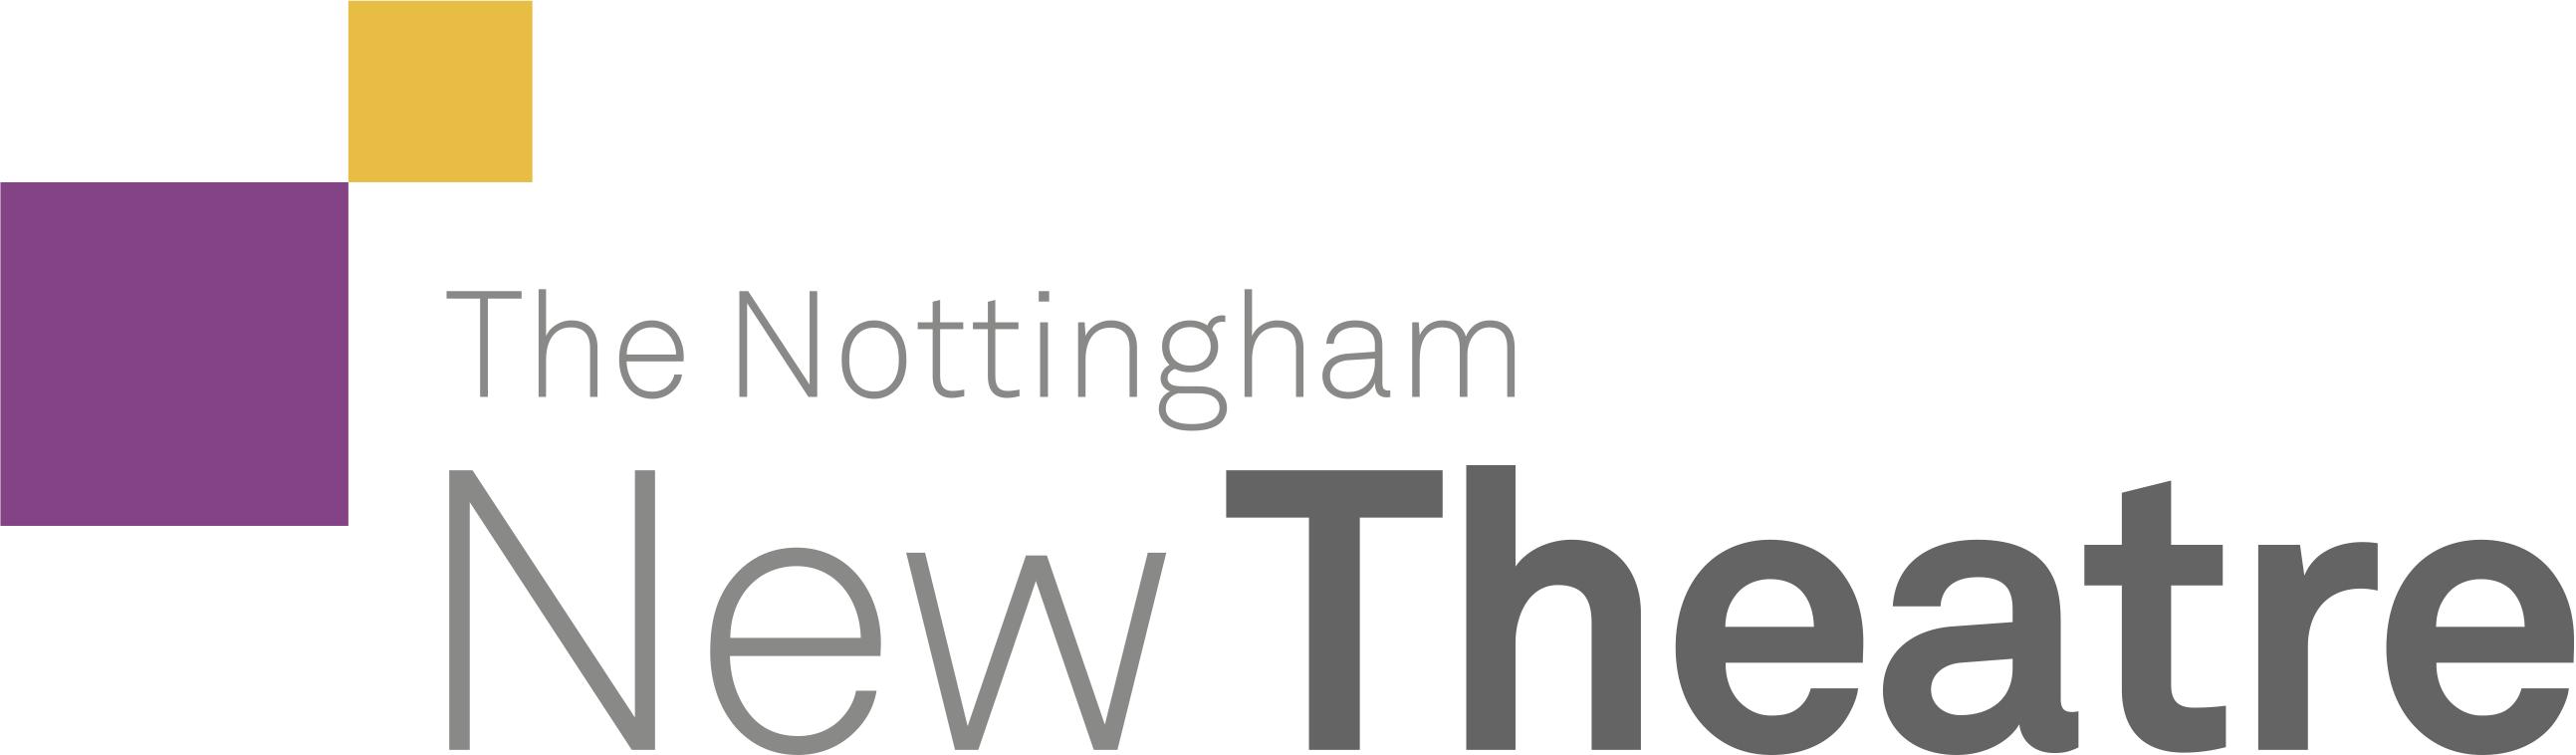 Nottingham New Theatre logo